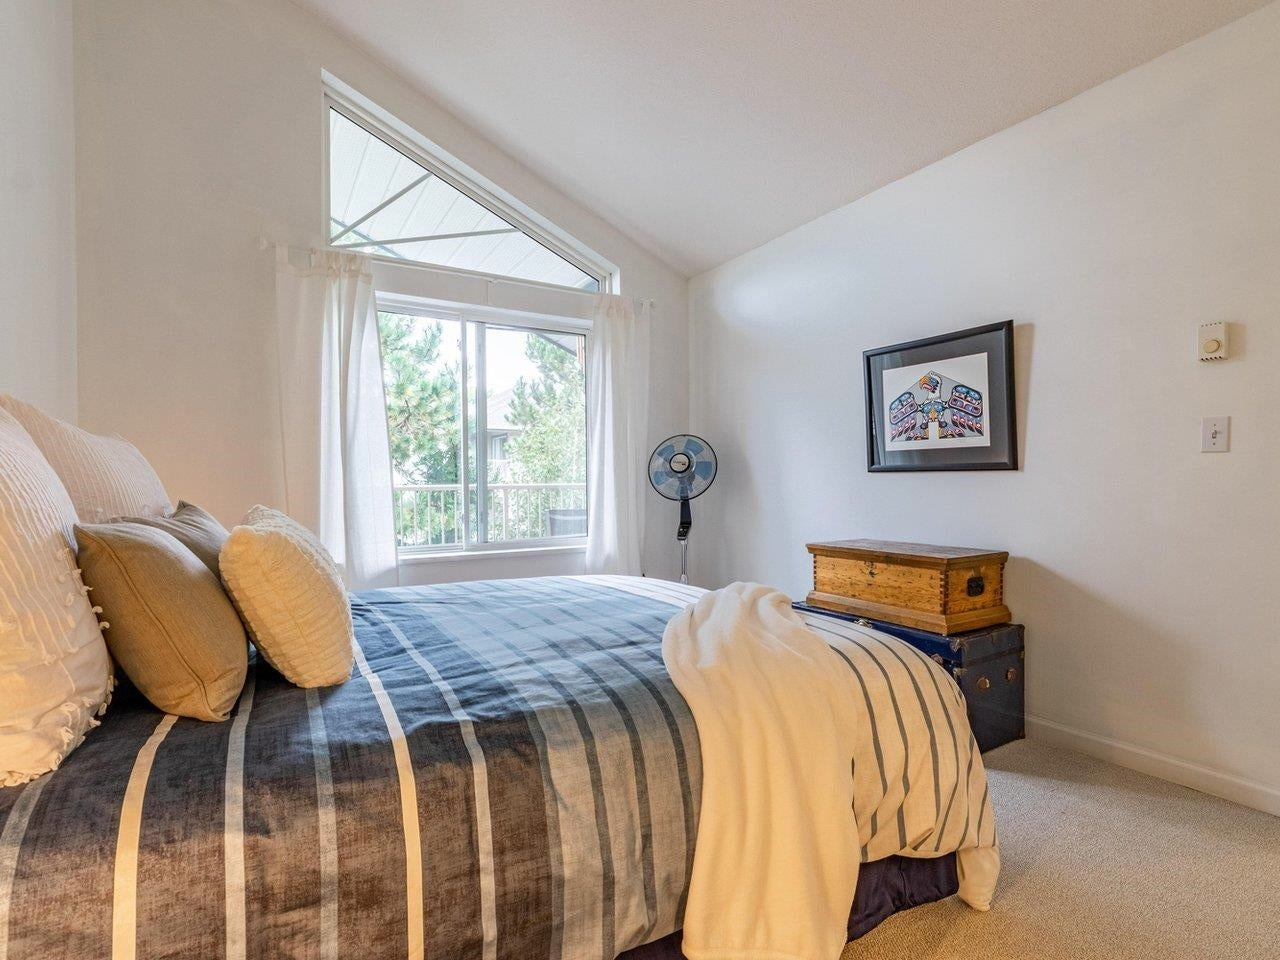 306 15298 20 AVENUE - King George Corridor Apartment/Condo for sale, 2 Bedrooms (R2625551) - #21